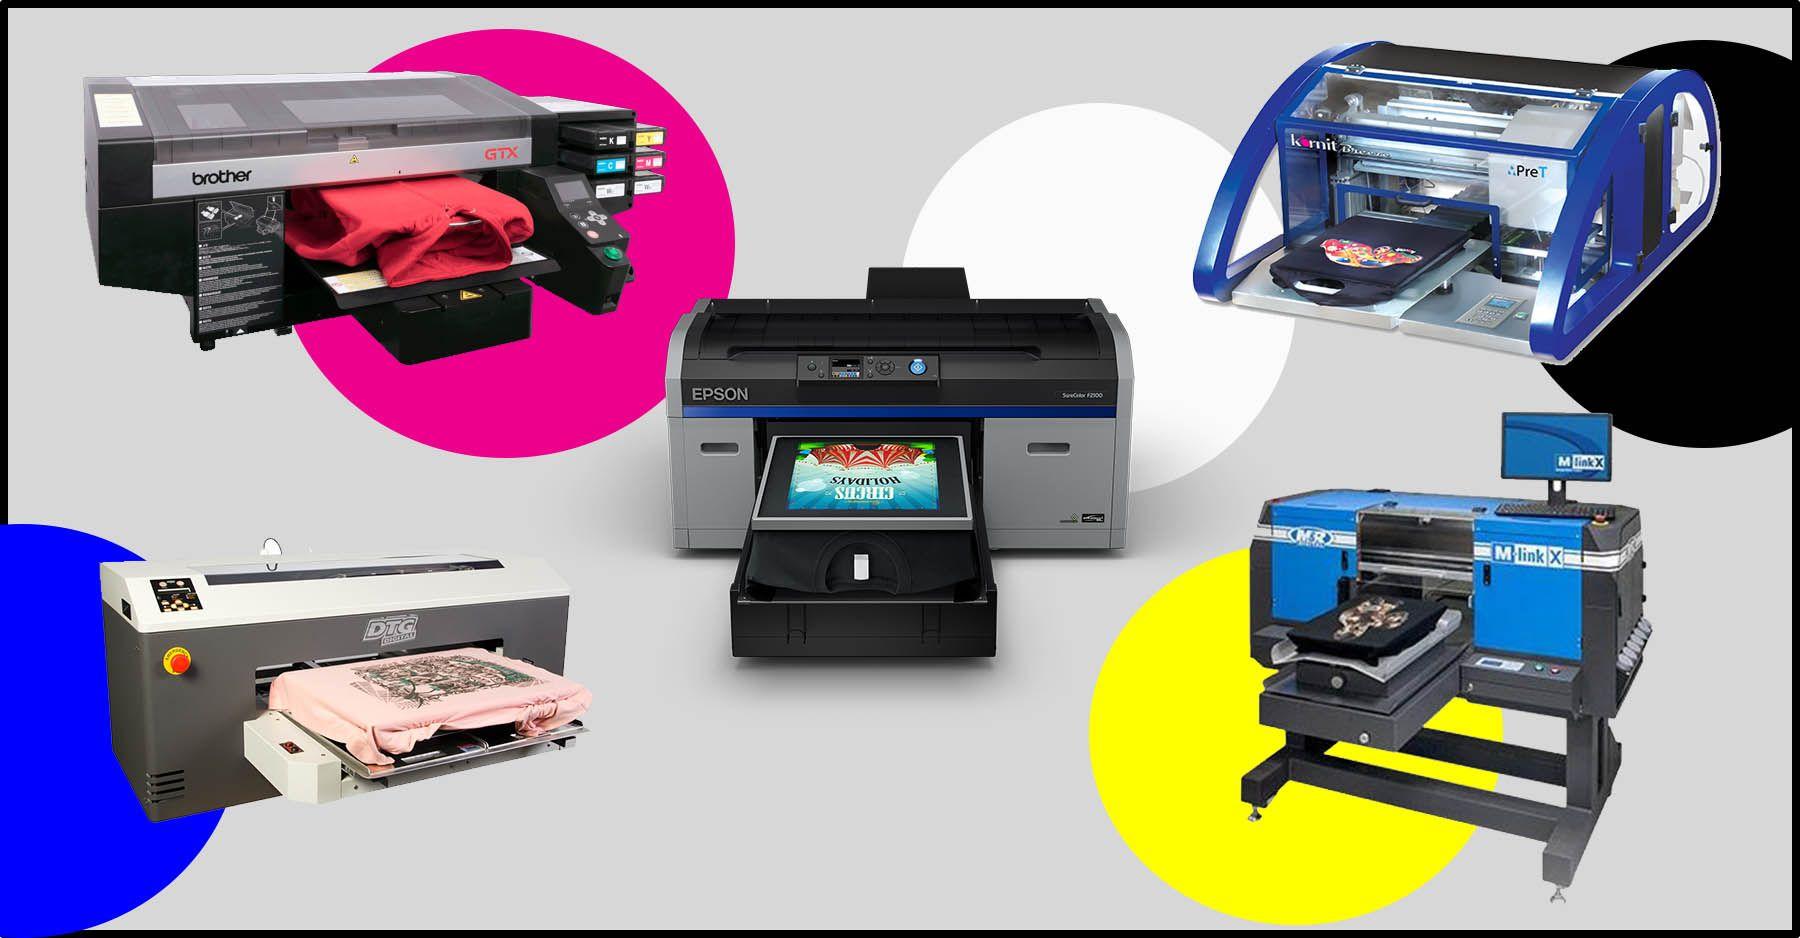 The Top 5 T Shirt Printing Machines Of 2018 W Comparison Table T Shirt Printing Machine T Shirt Printer Design Printer